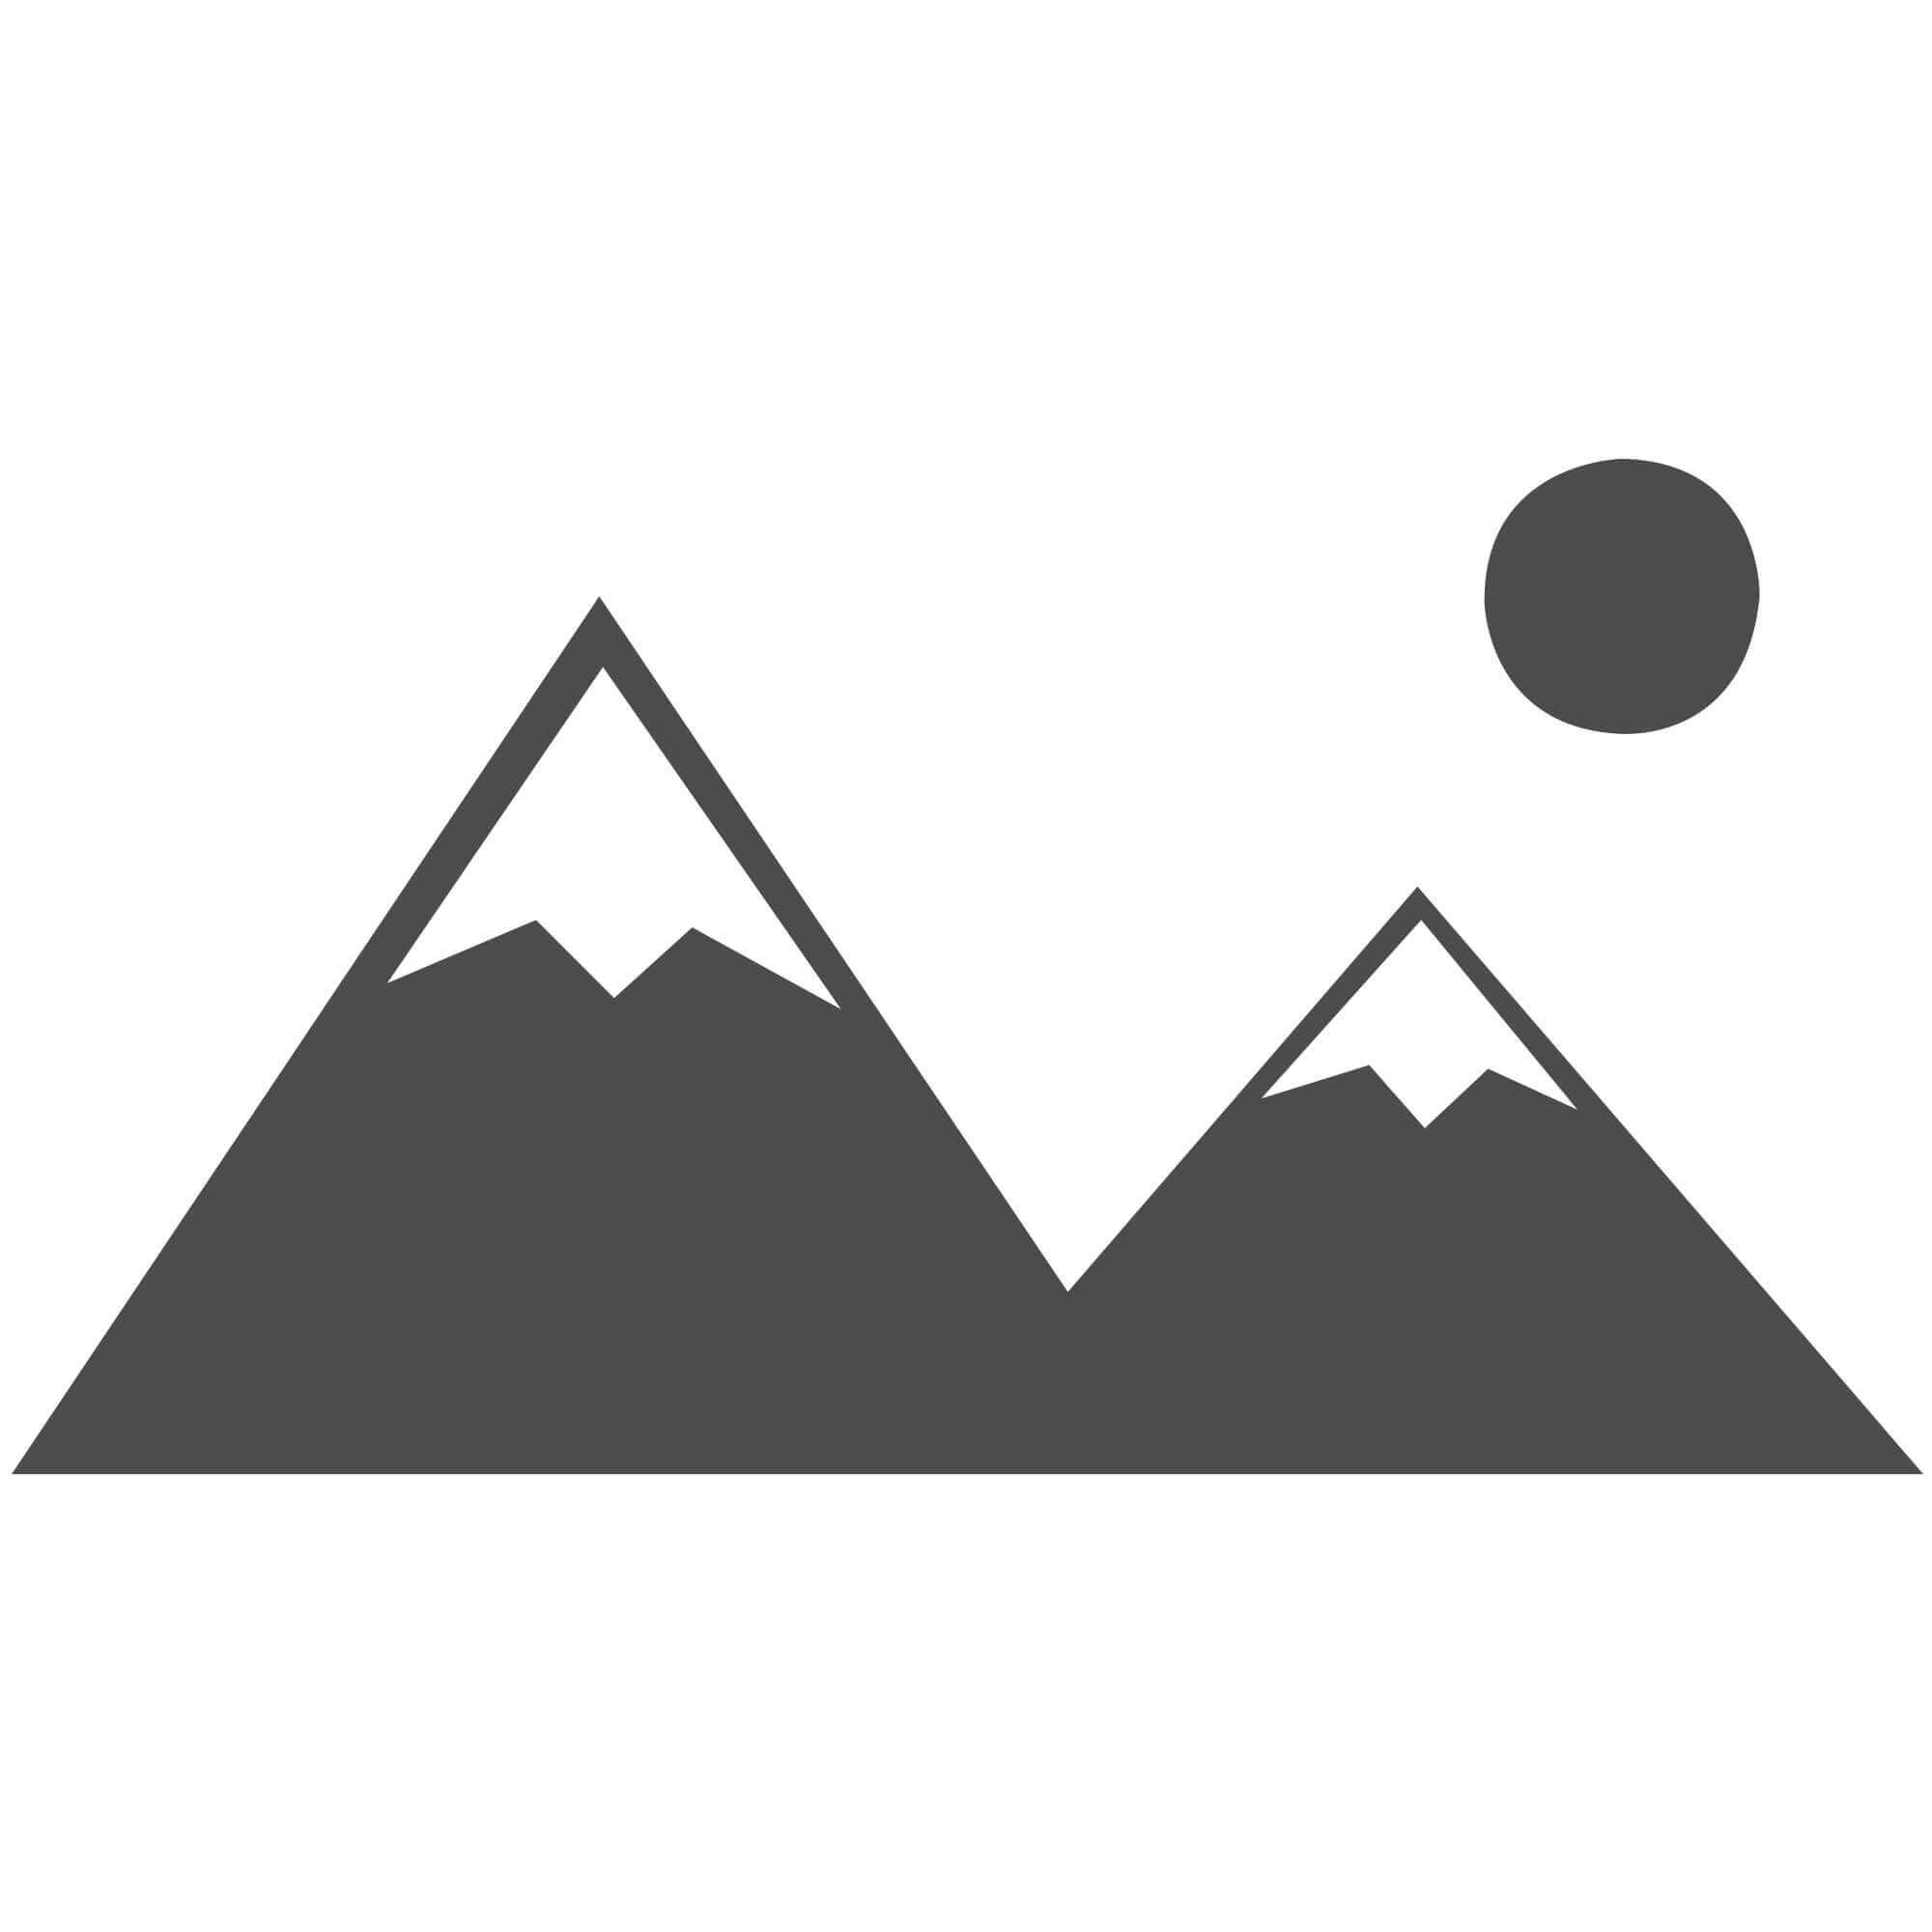 "Arabesque Moroccan Pattern Wool Rug - Blue -120 x 170 cm (4' x 5'7"")"